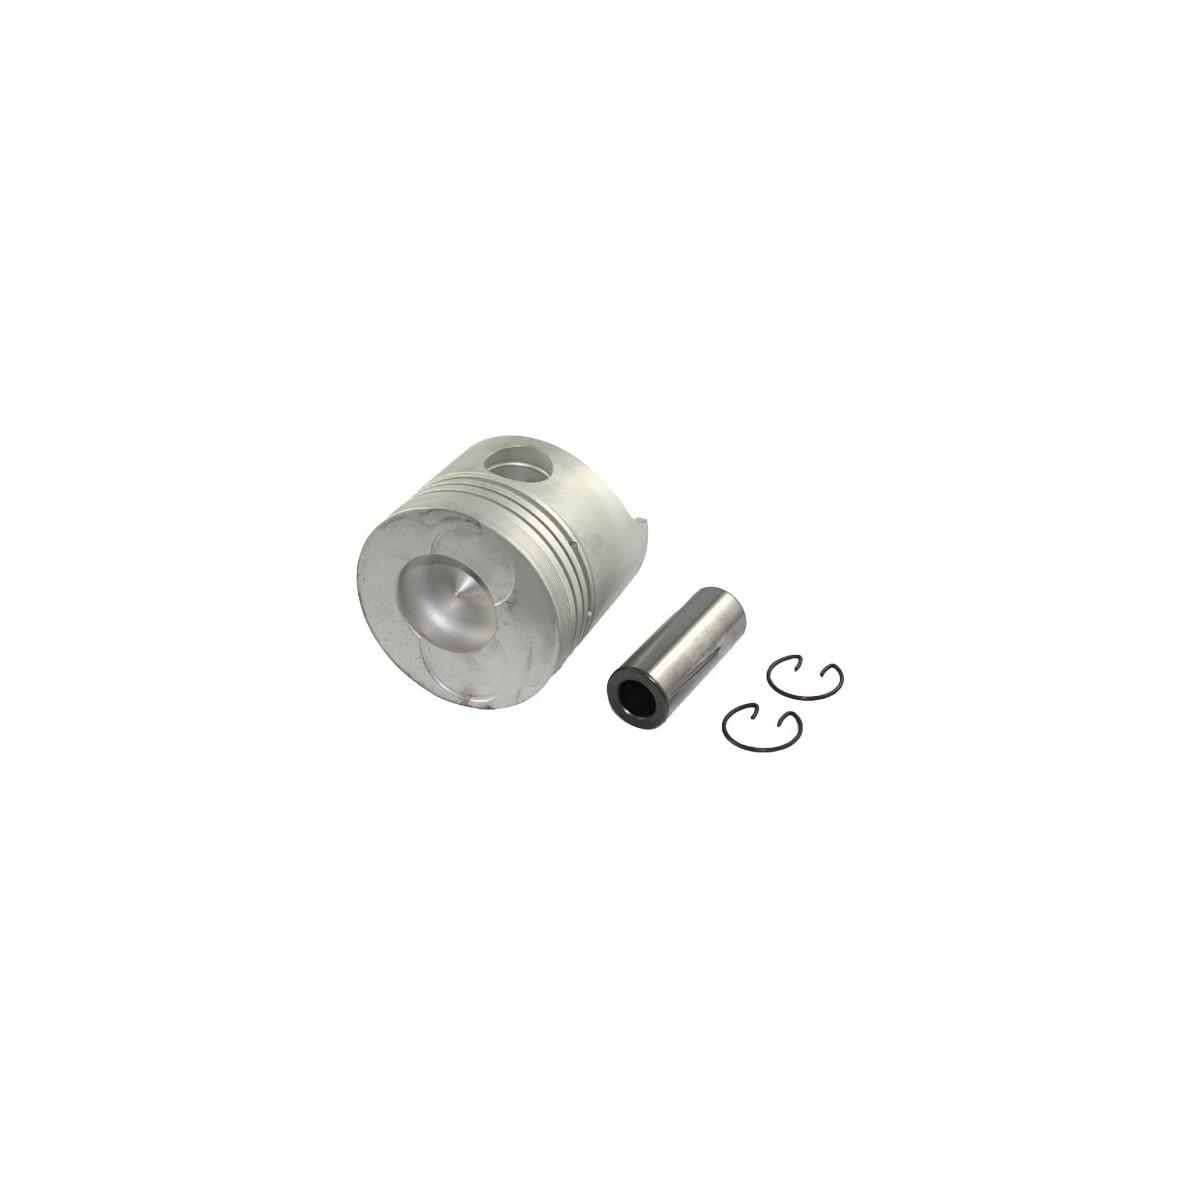 Piston HINOMOTO N239 82 mm STD